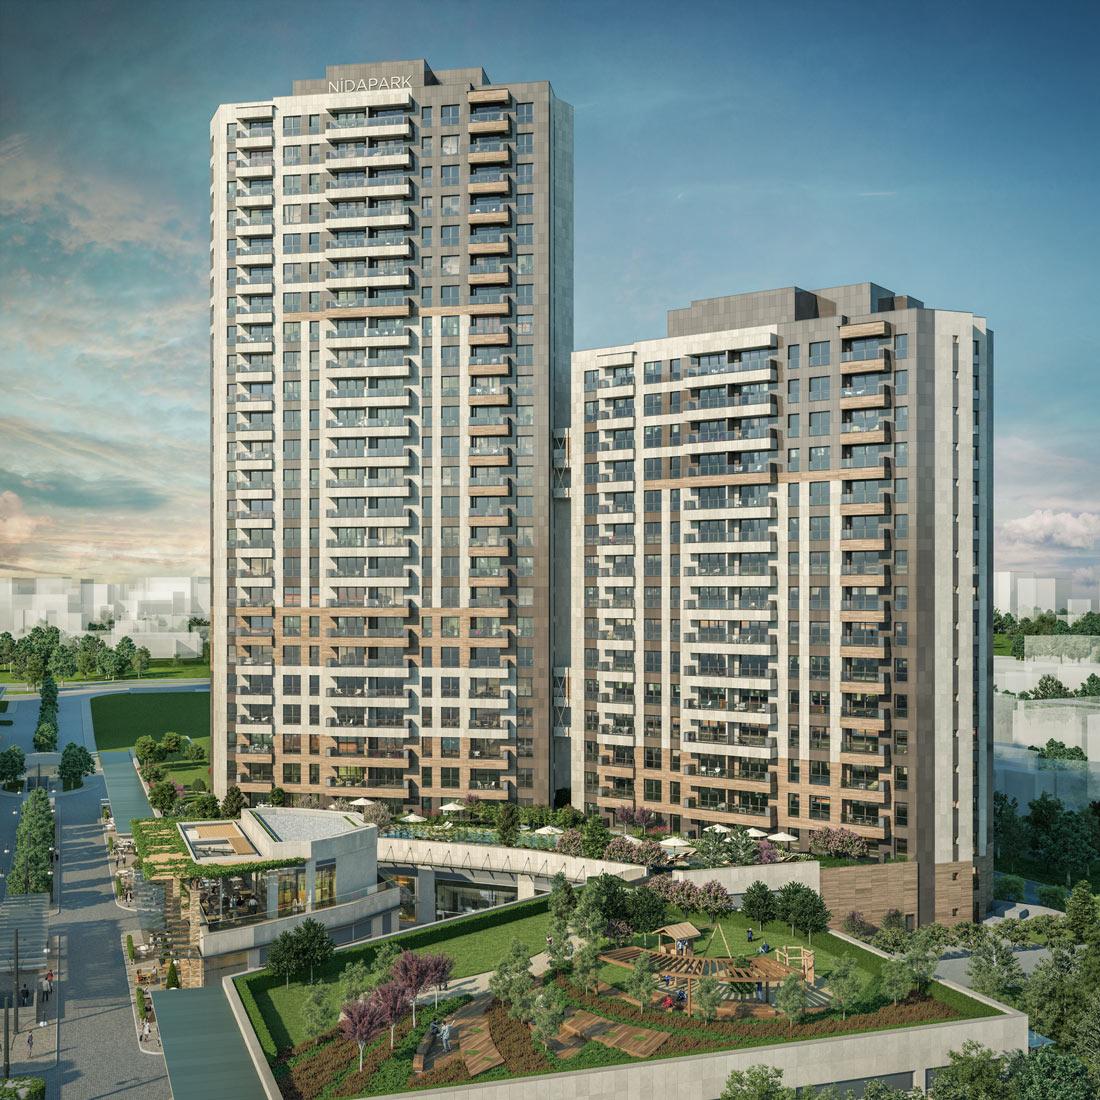 nidapark-kucukyali-istanbul-for-sale-residences-seaside13